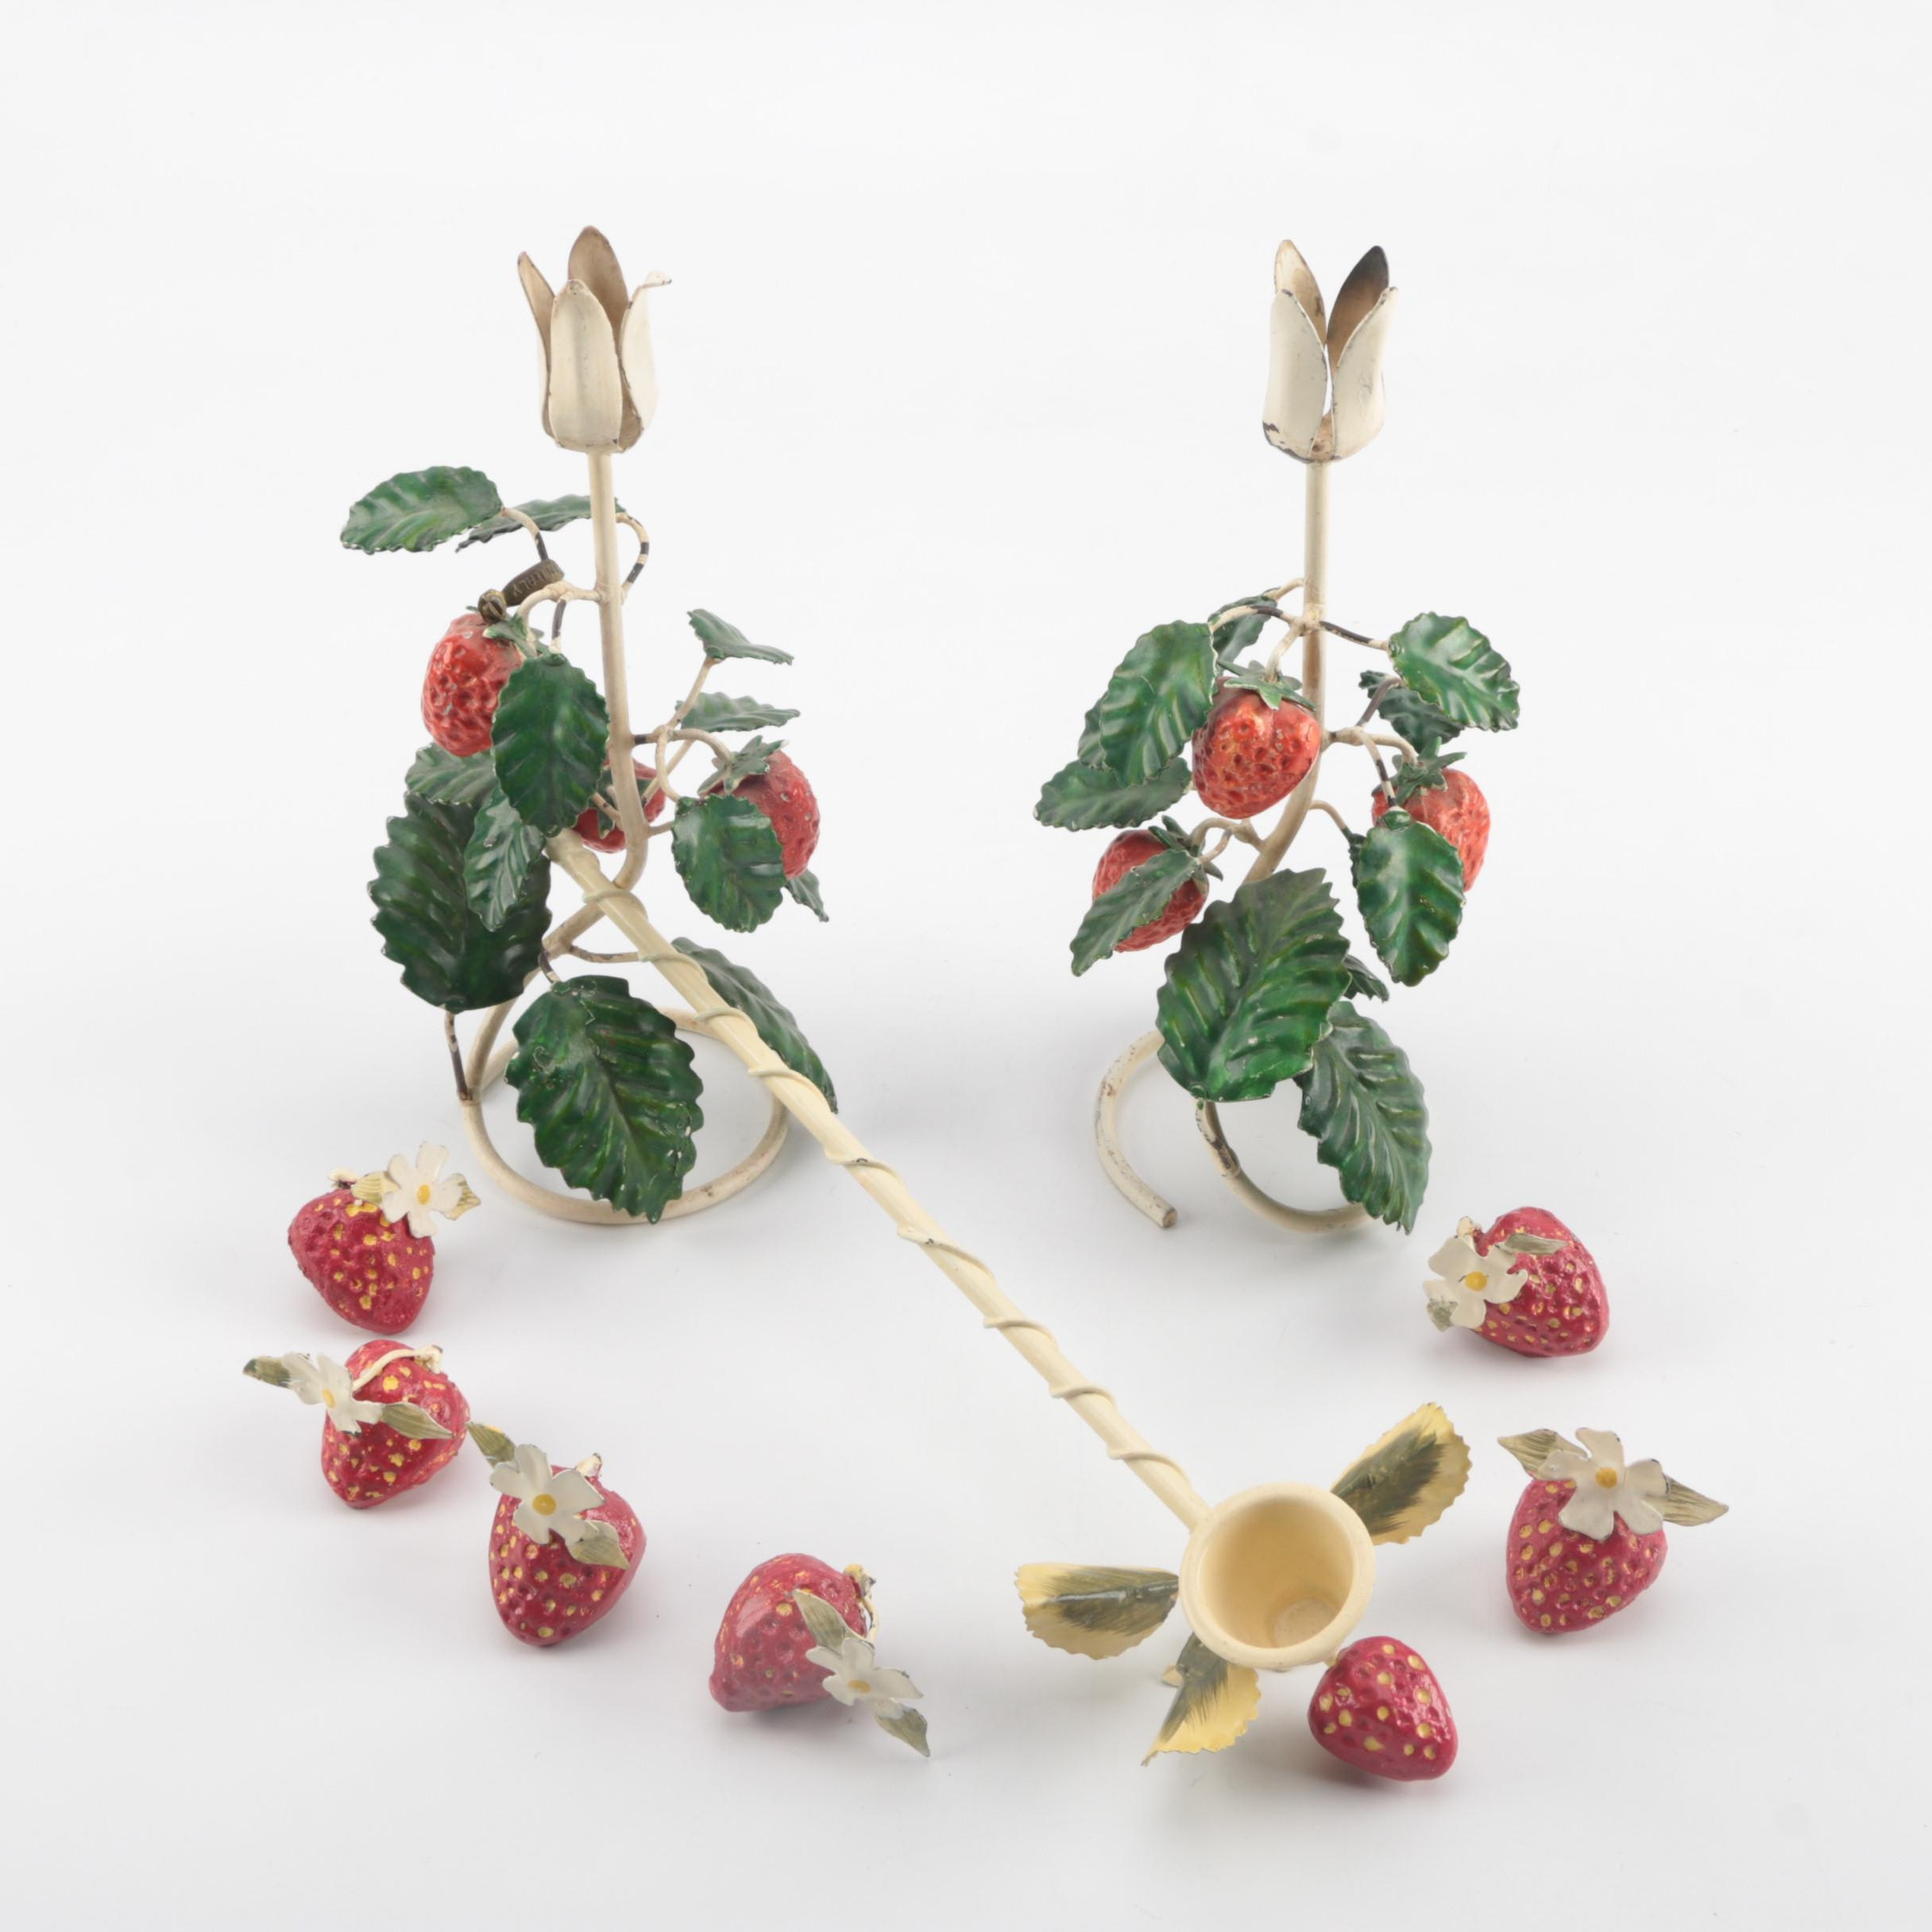 Strawberry Themed Decor